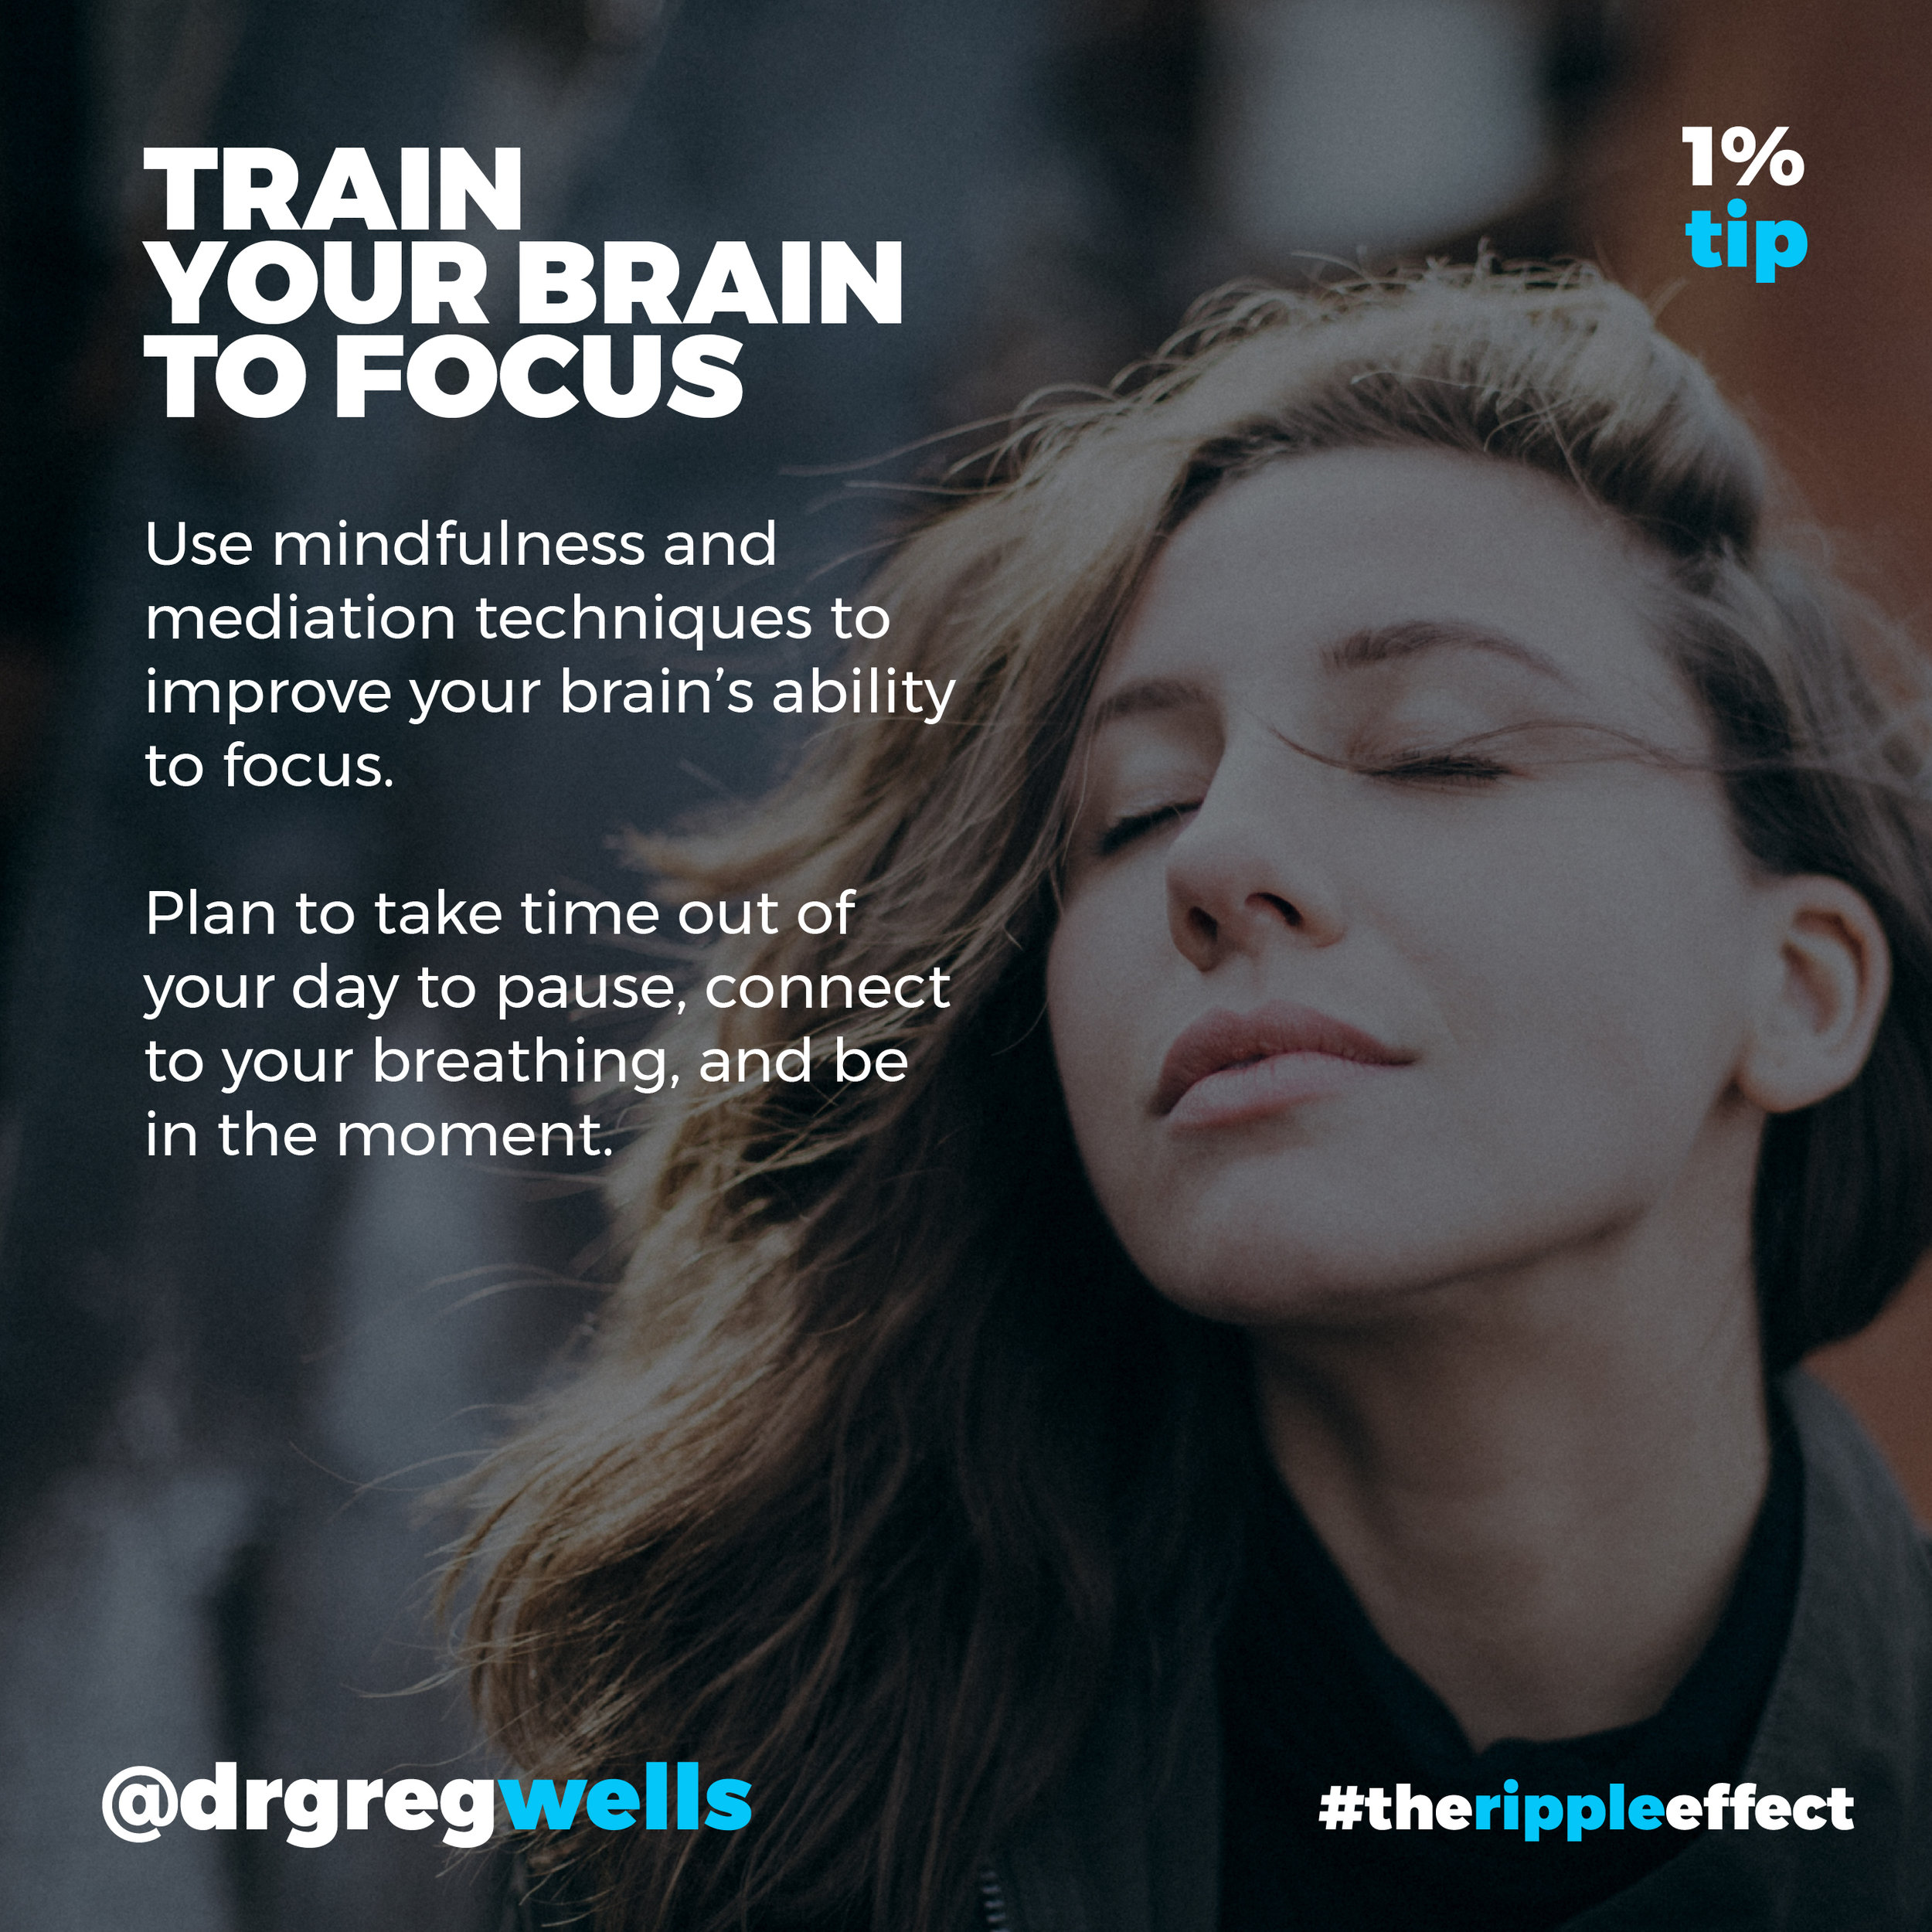 1% Tips train your brain 2019-01.jpg